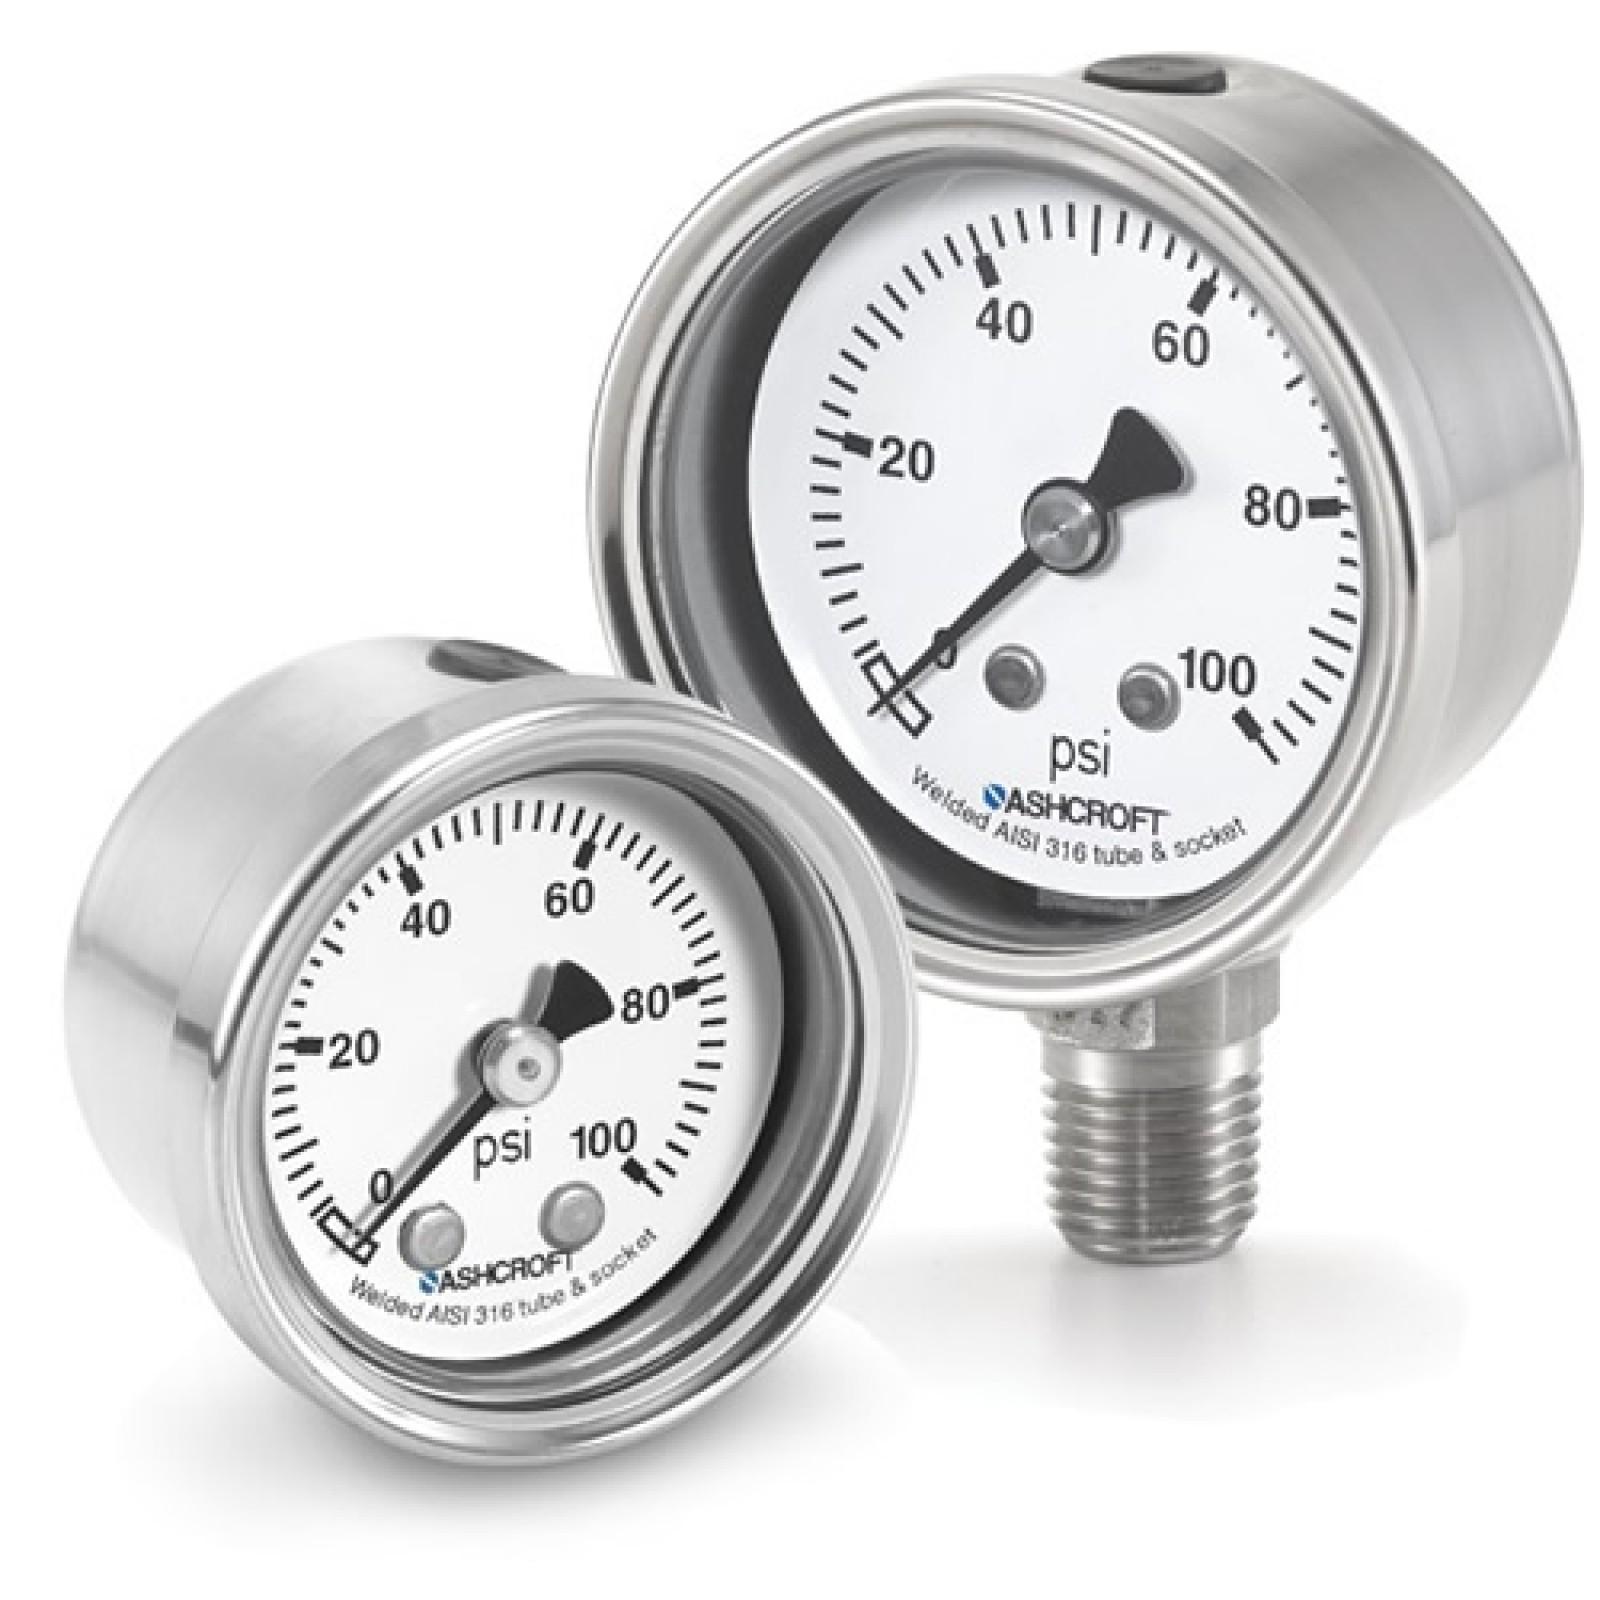 "63 1008S 02L 10000#/KP - Pressure Gauge, 63mm stainless 1/4"" NPT Lower conn & Case, 0/10,000 psi"